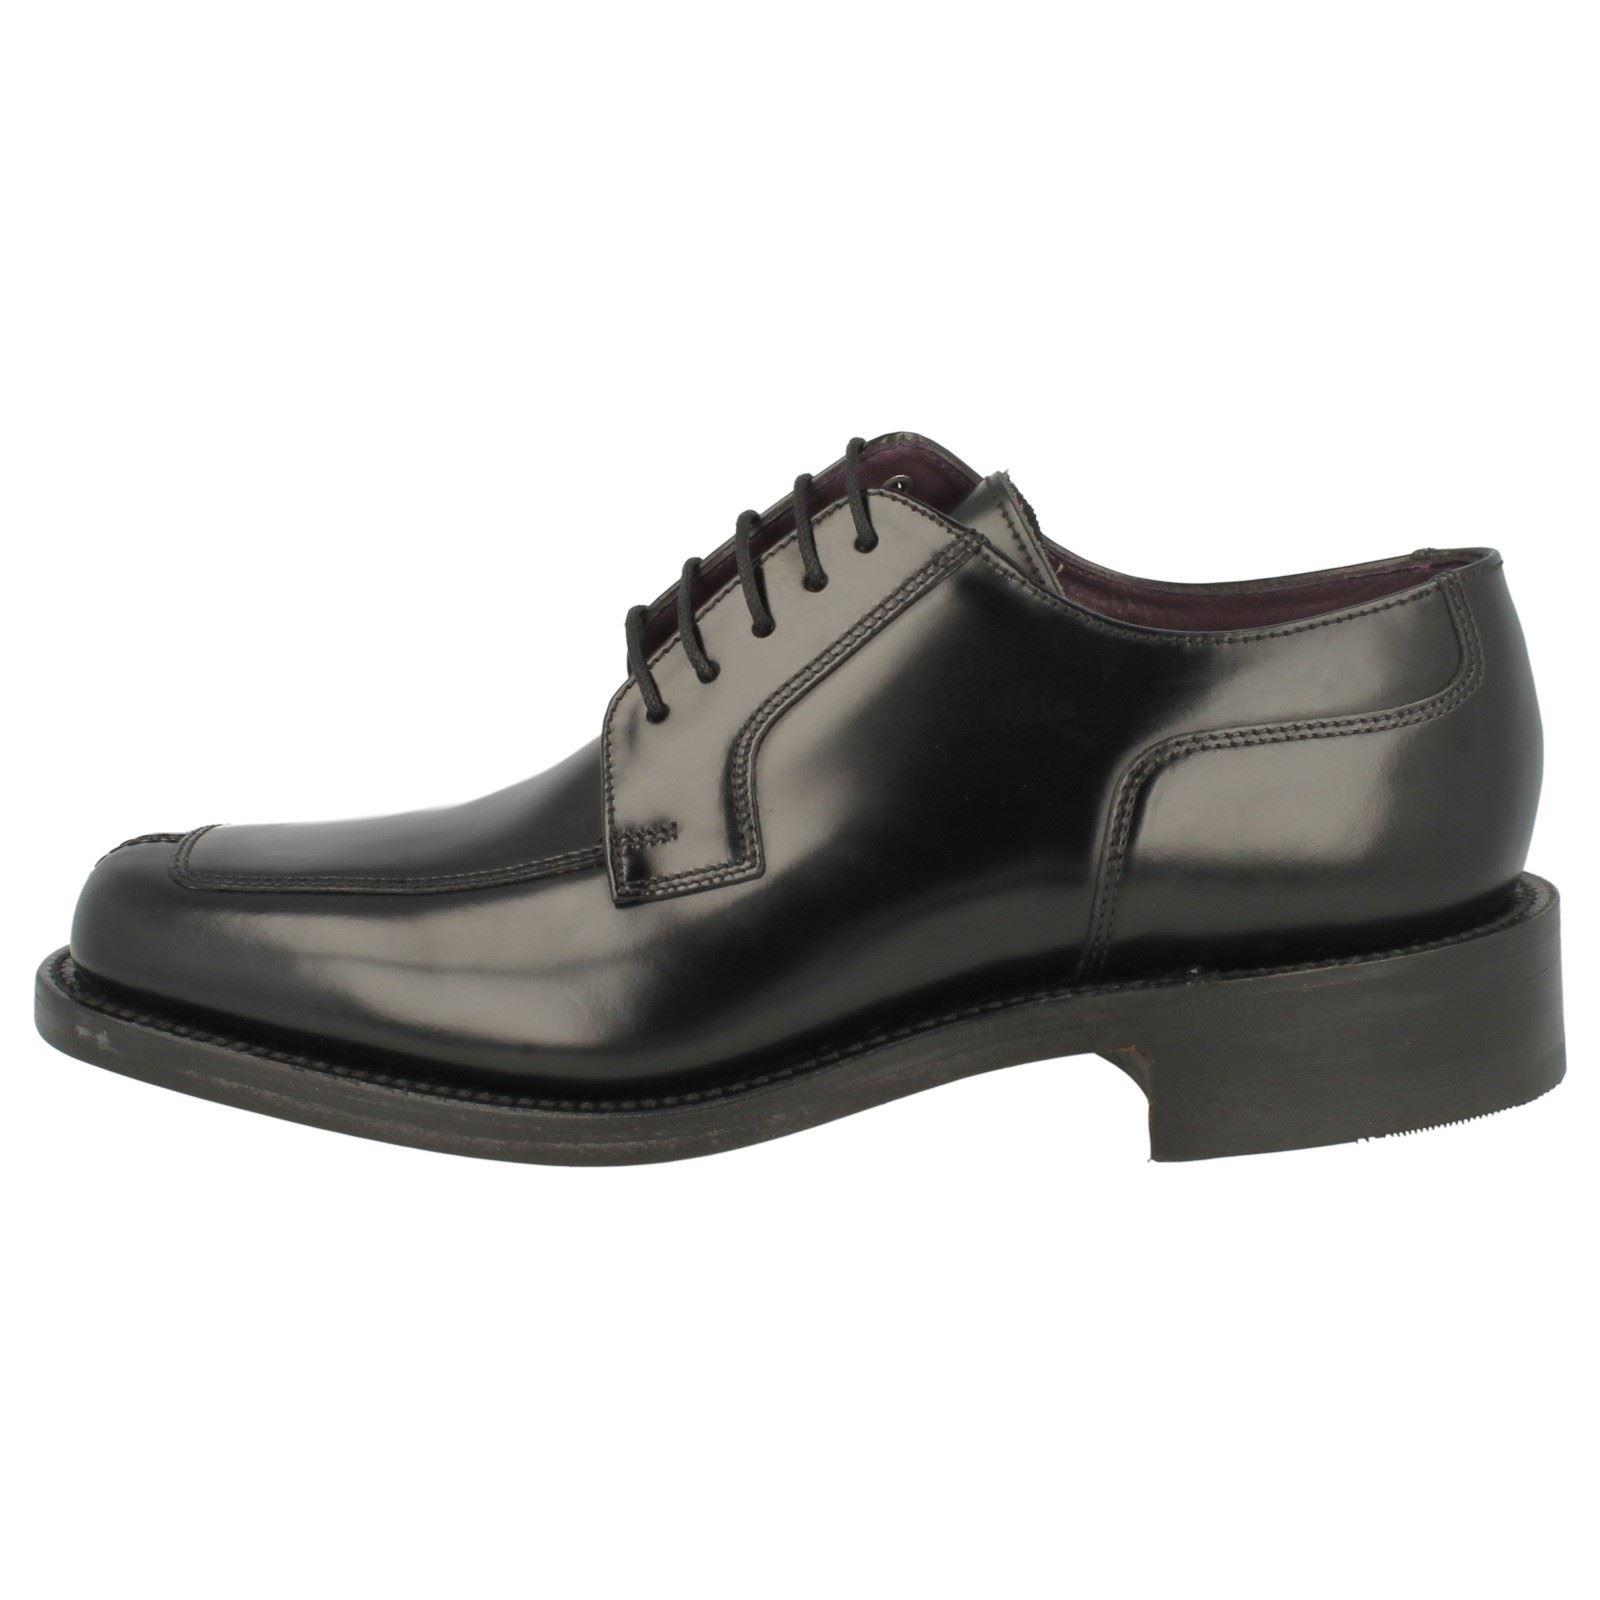 1303b Lace Nero Up Loake Mens Shoes TvRpBWcUq